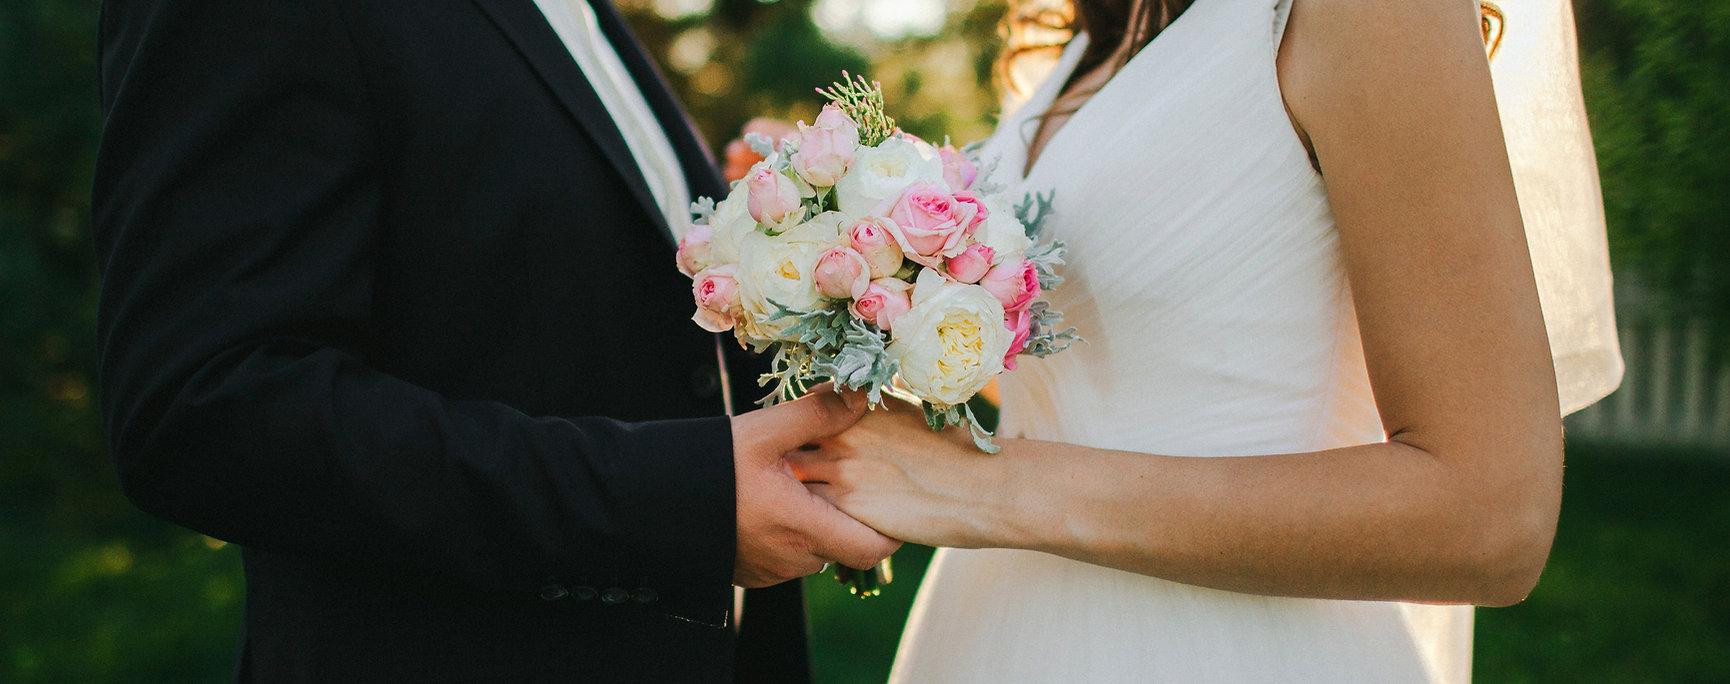 Wedding Day Djs Video